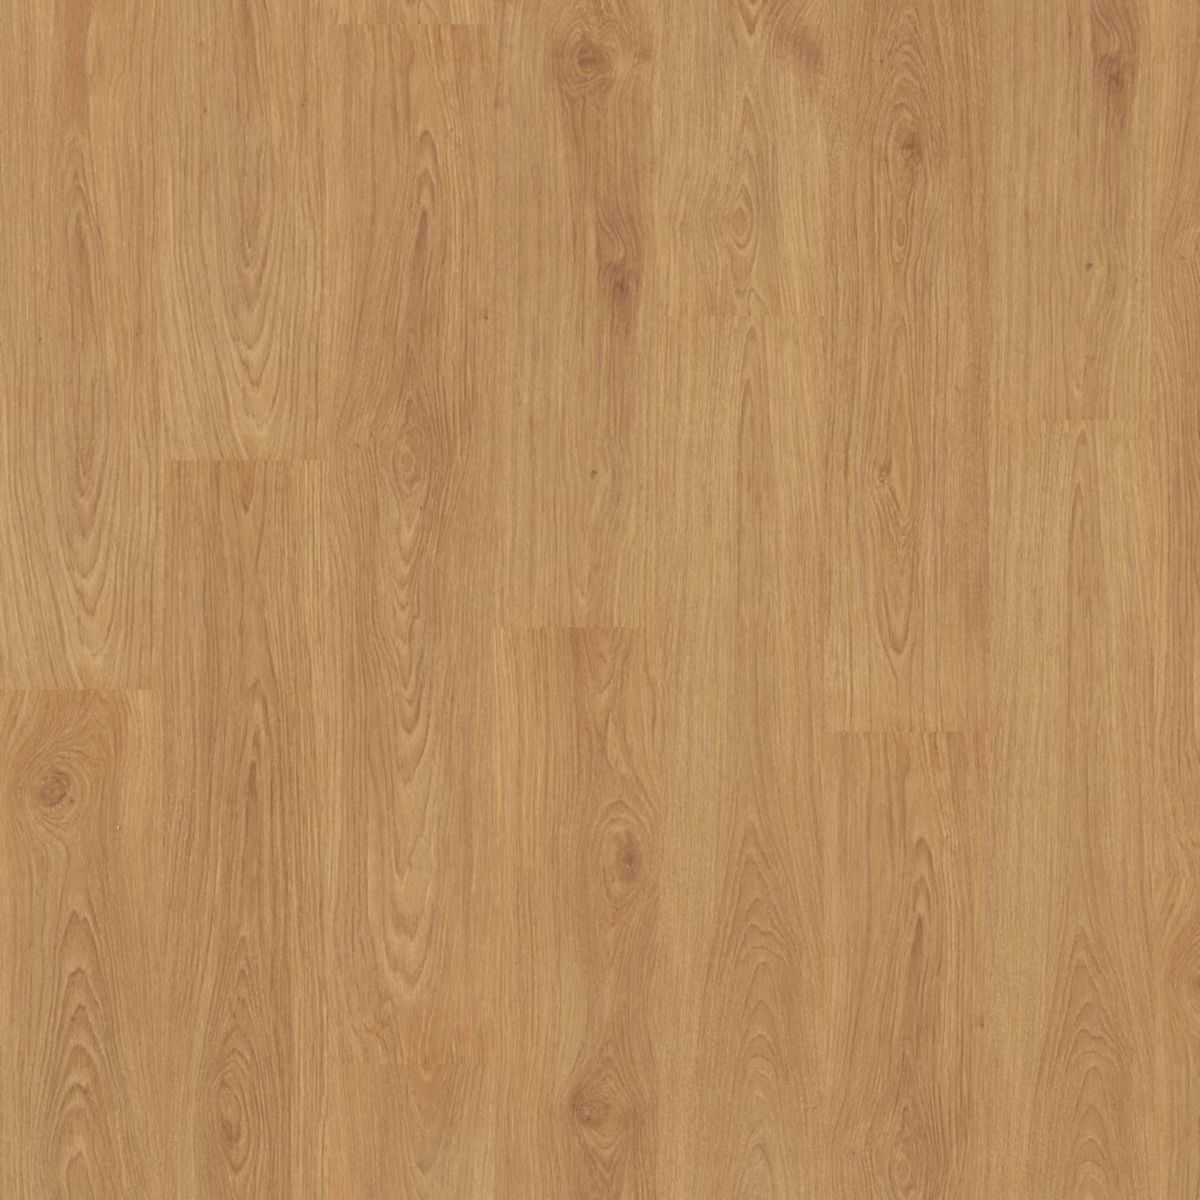 fournisseurs de planchers stratifies. Black Bedroom Furniture Sets. Home Design Ideas